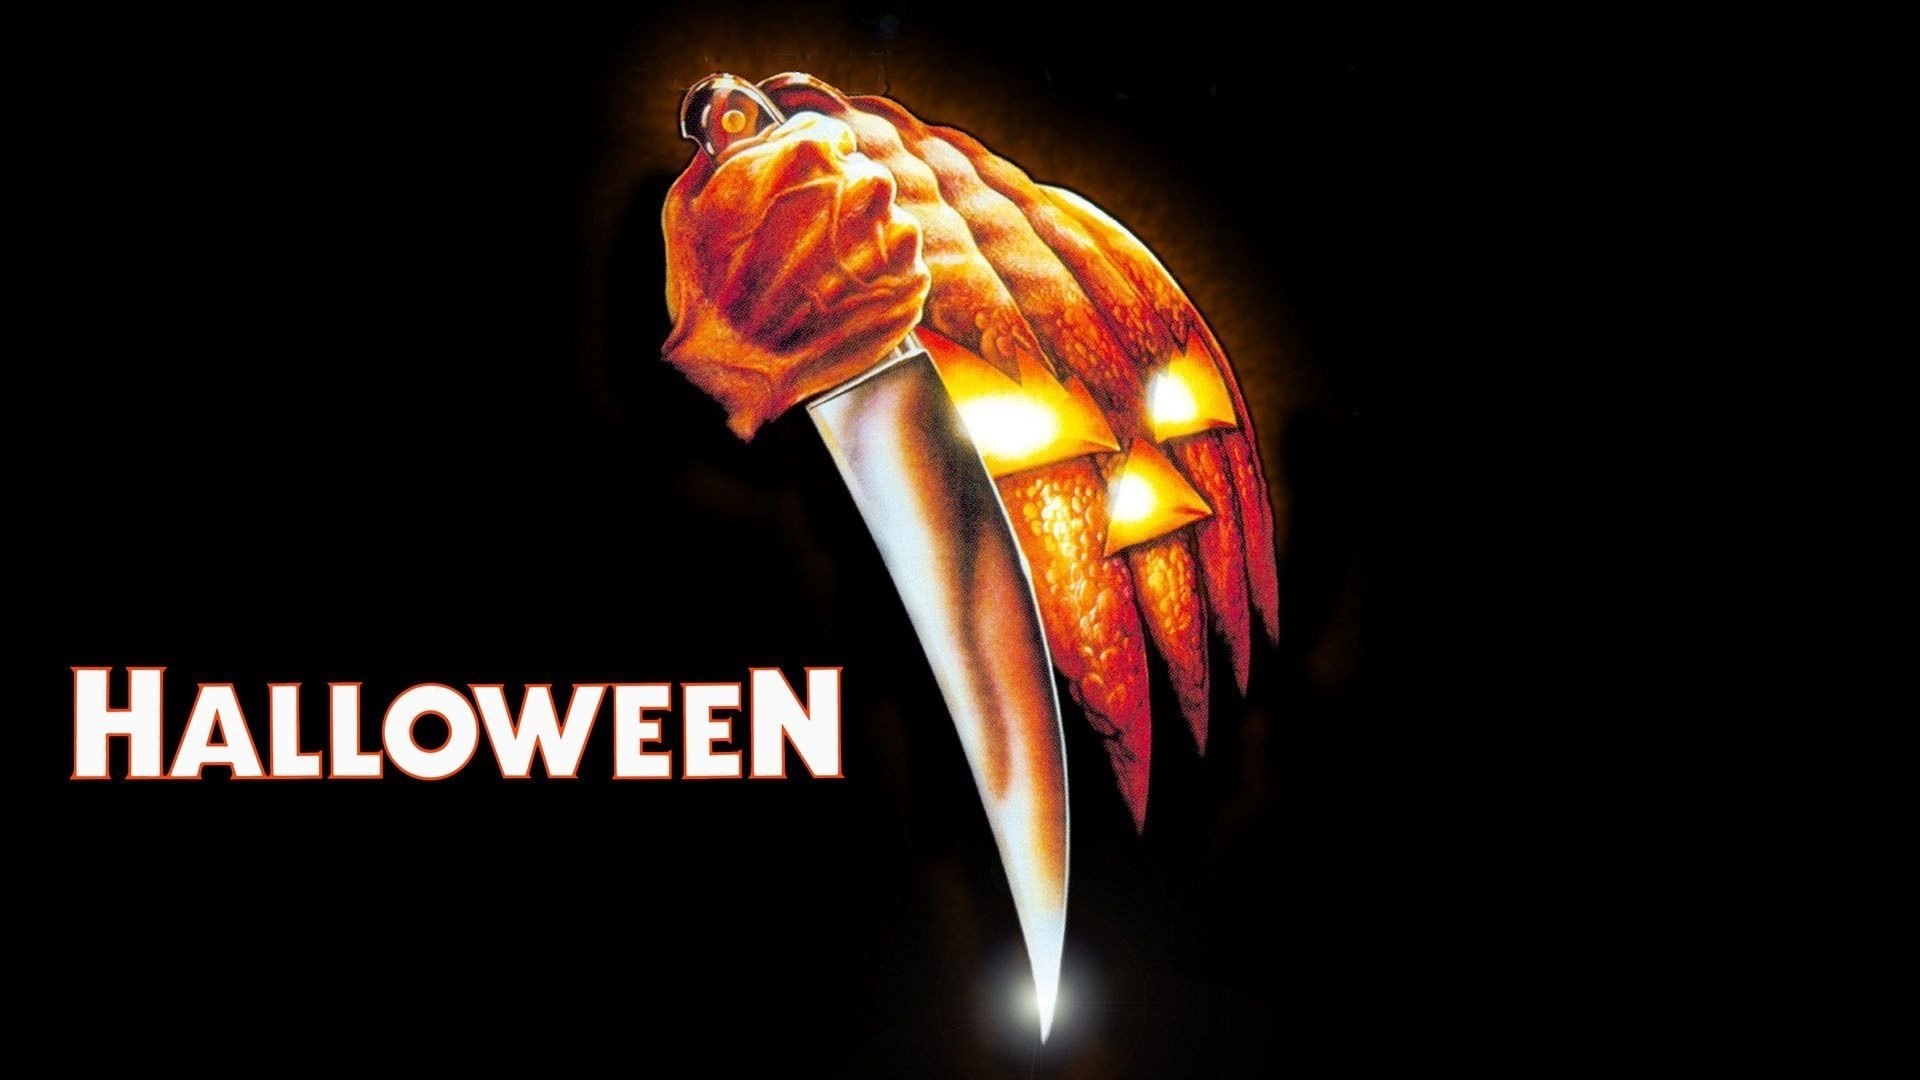 Halloween 1978 Wallpaper.Halloween 1978 Hd Wallpaper Background Image 1920x1080